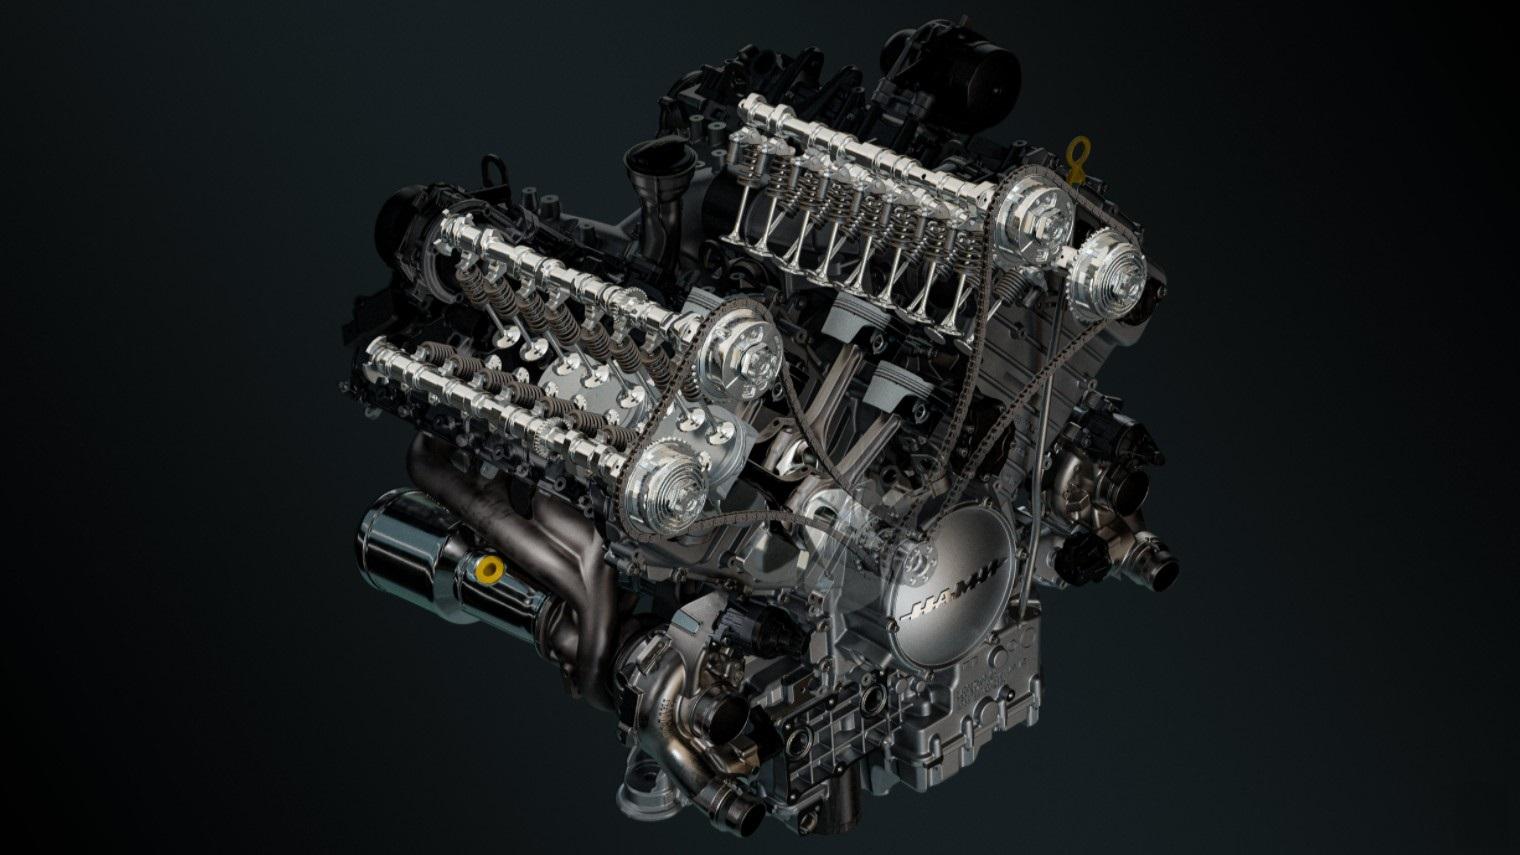 V8 двигатель Aurus